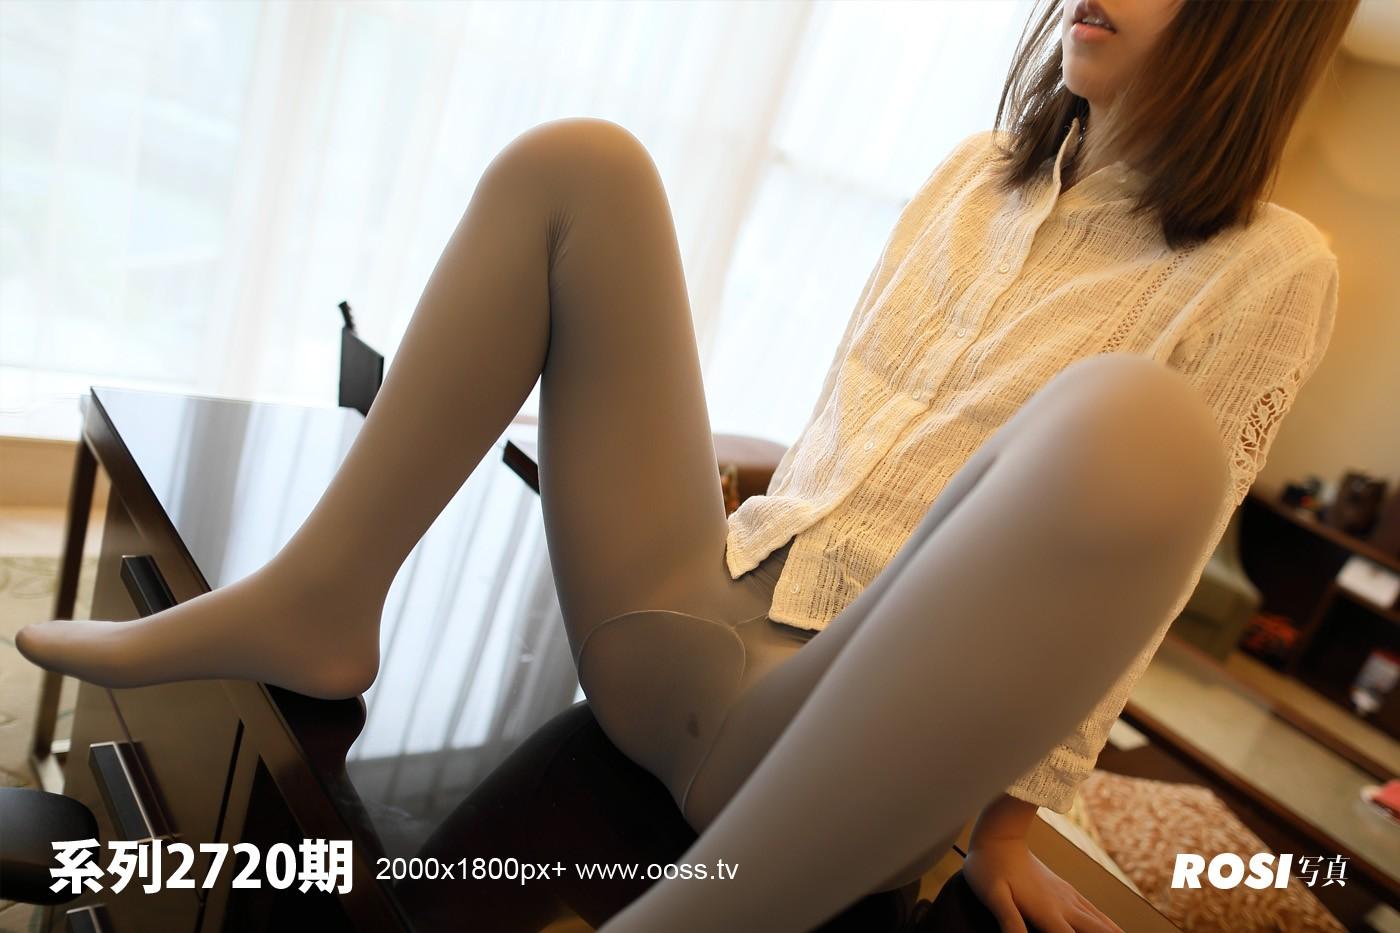 Rosi No.2720